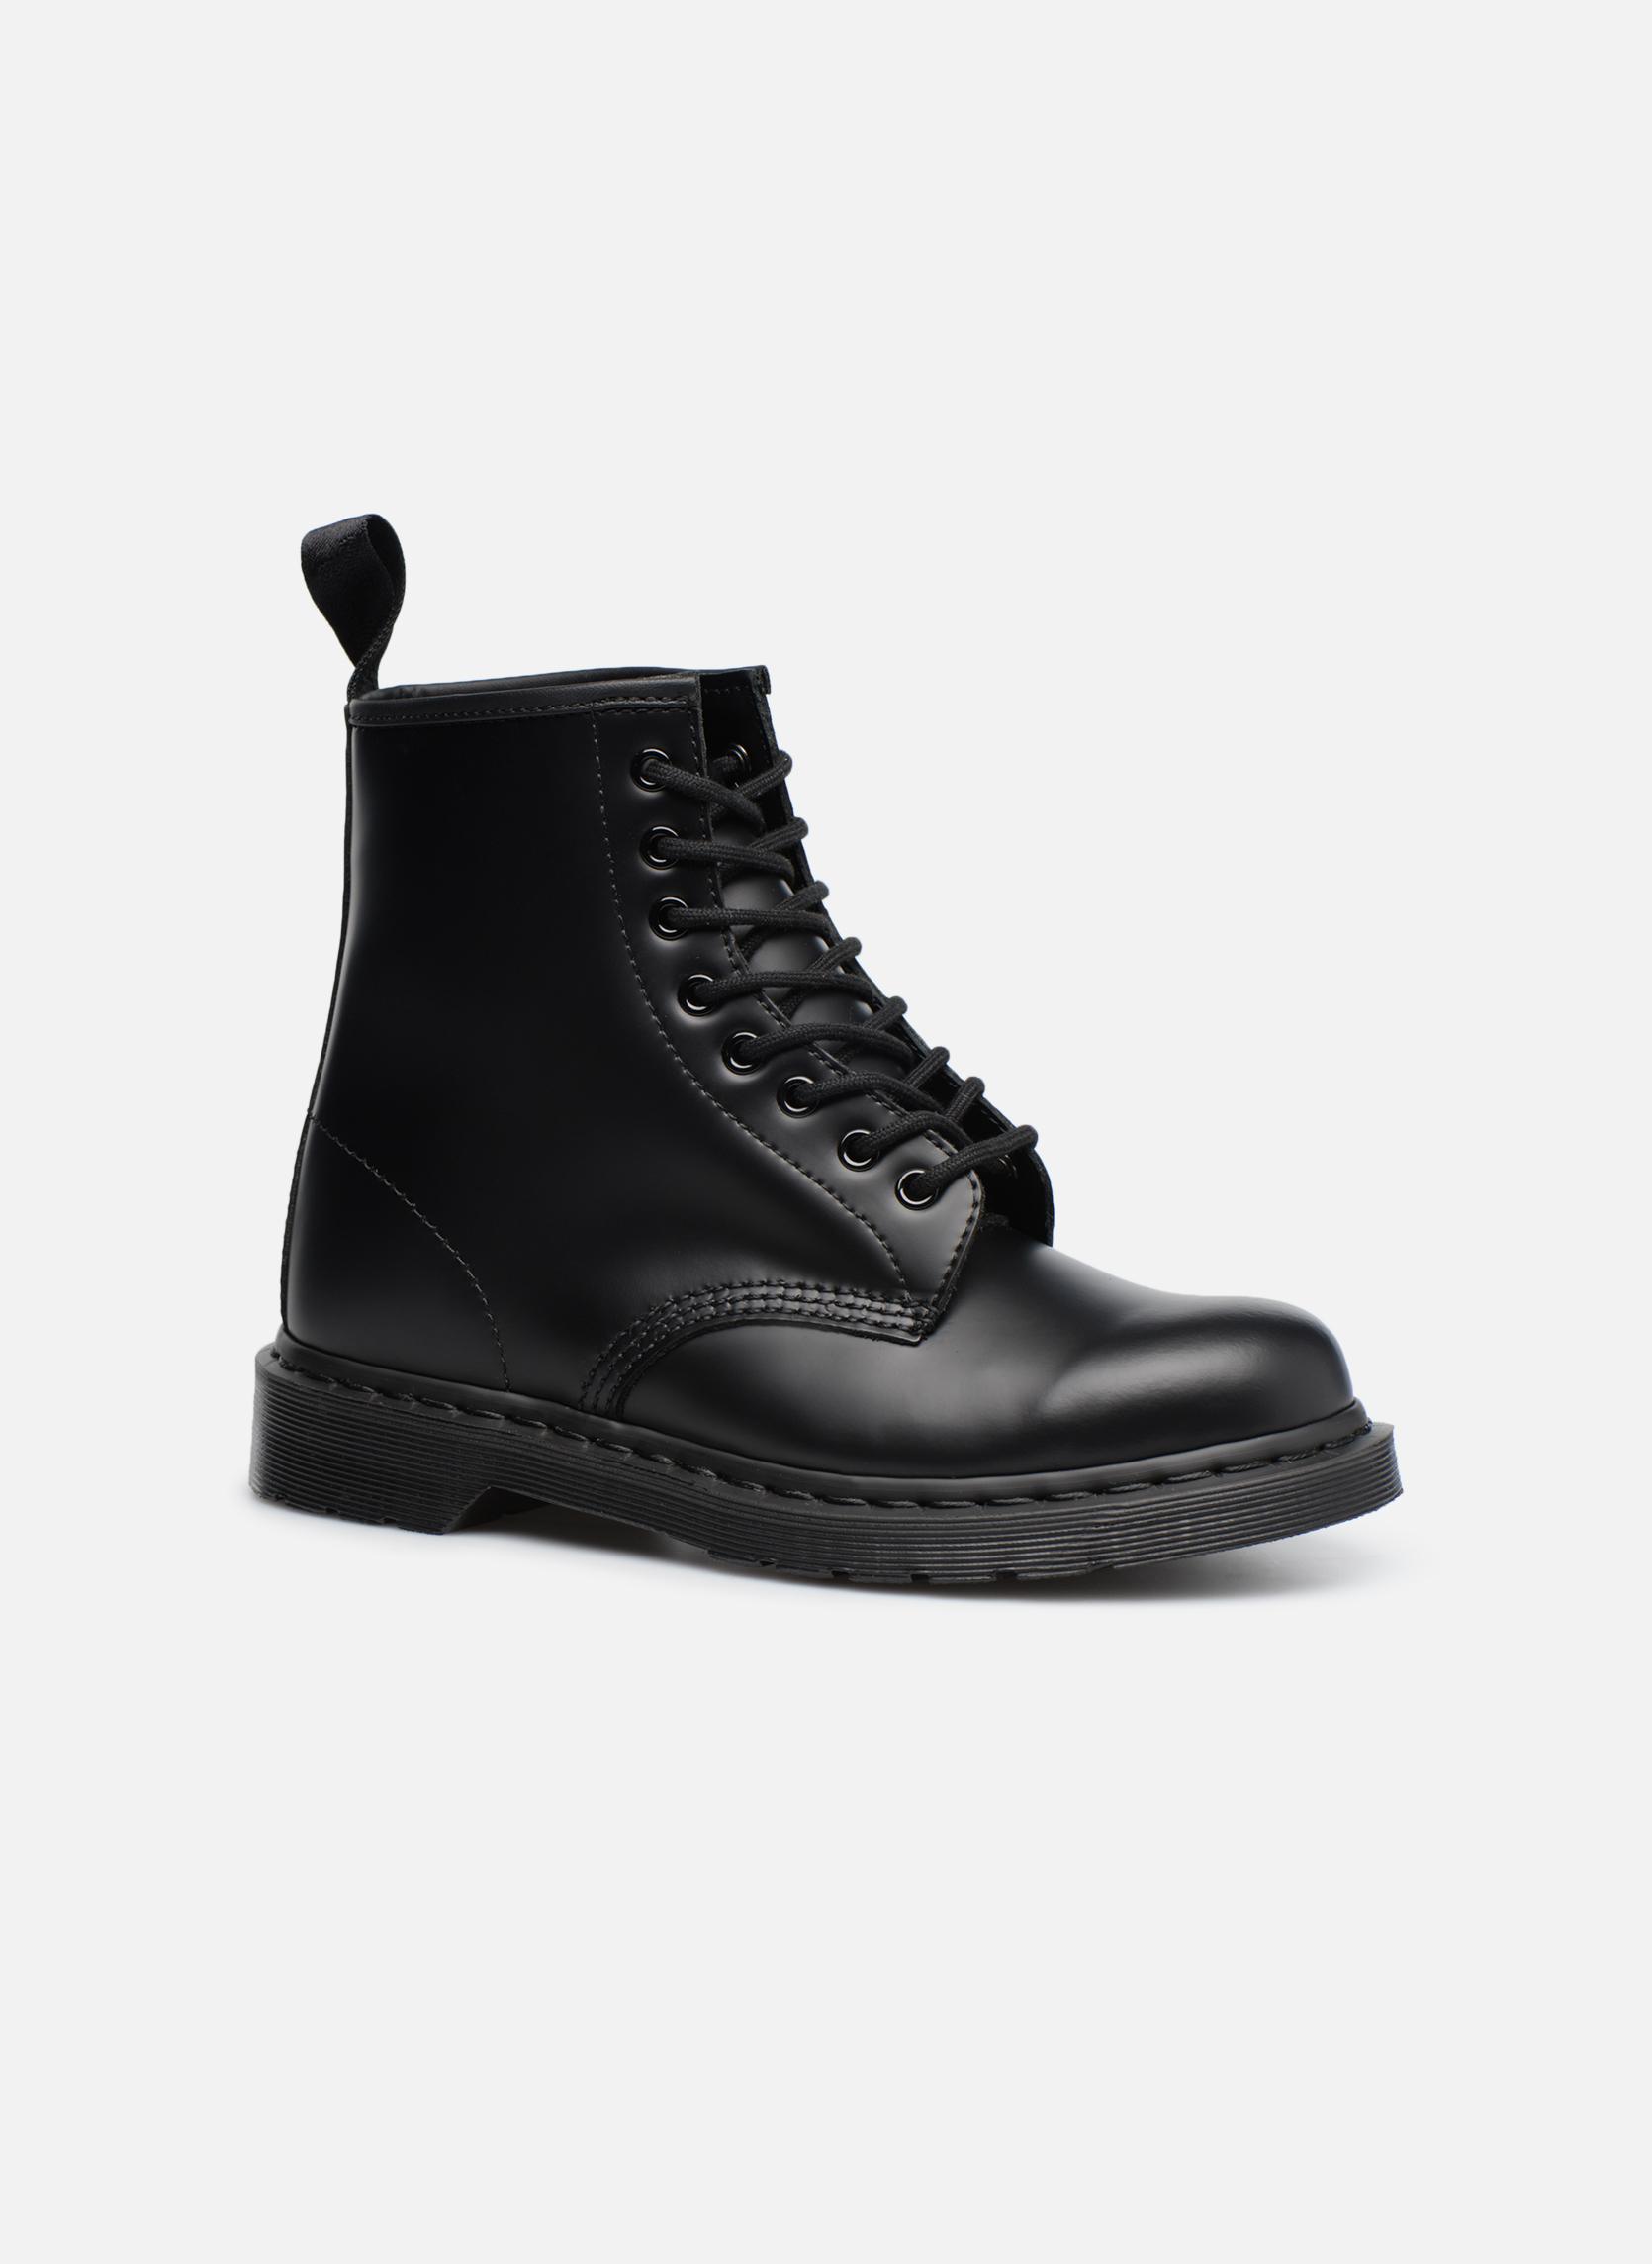 Ankle boots Women 1460 MONO